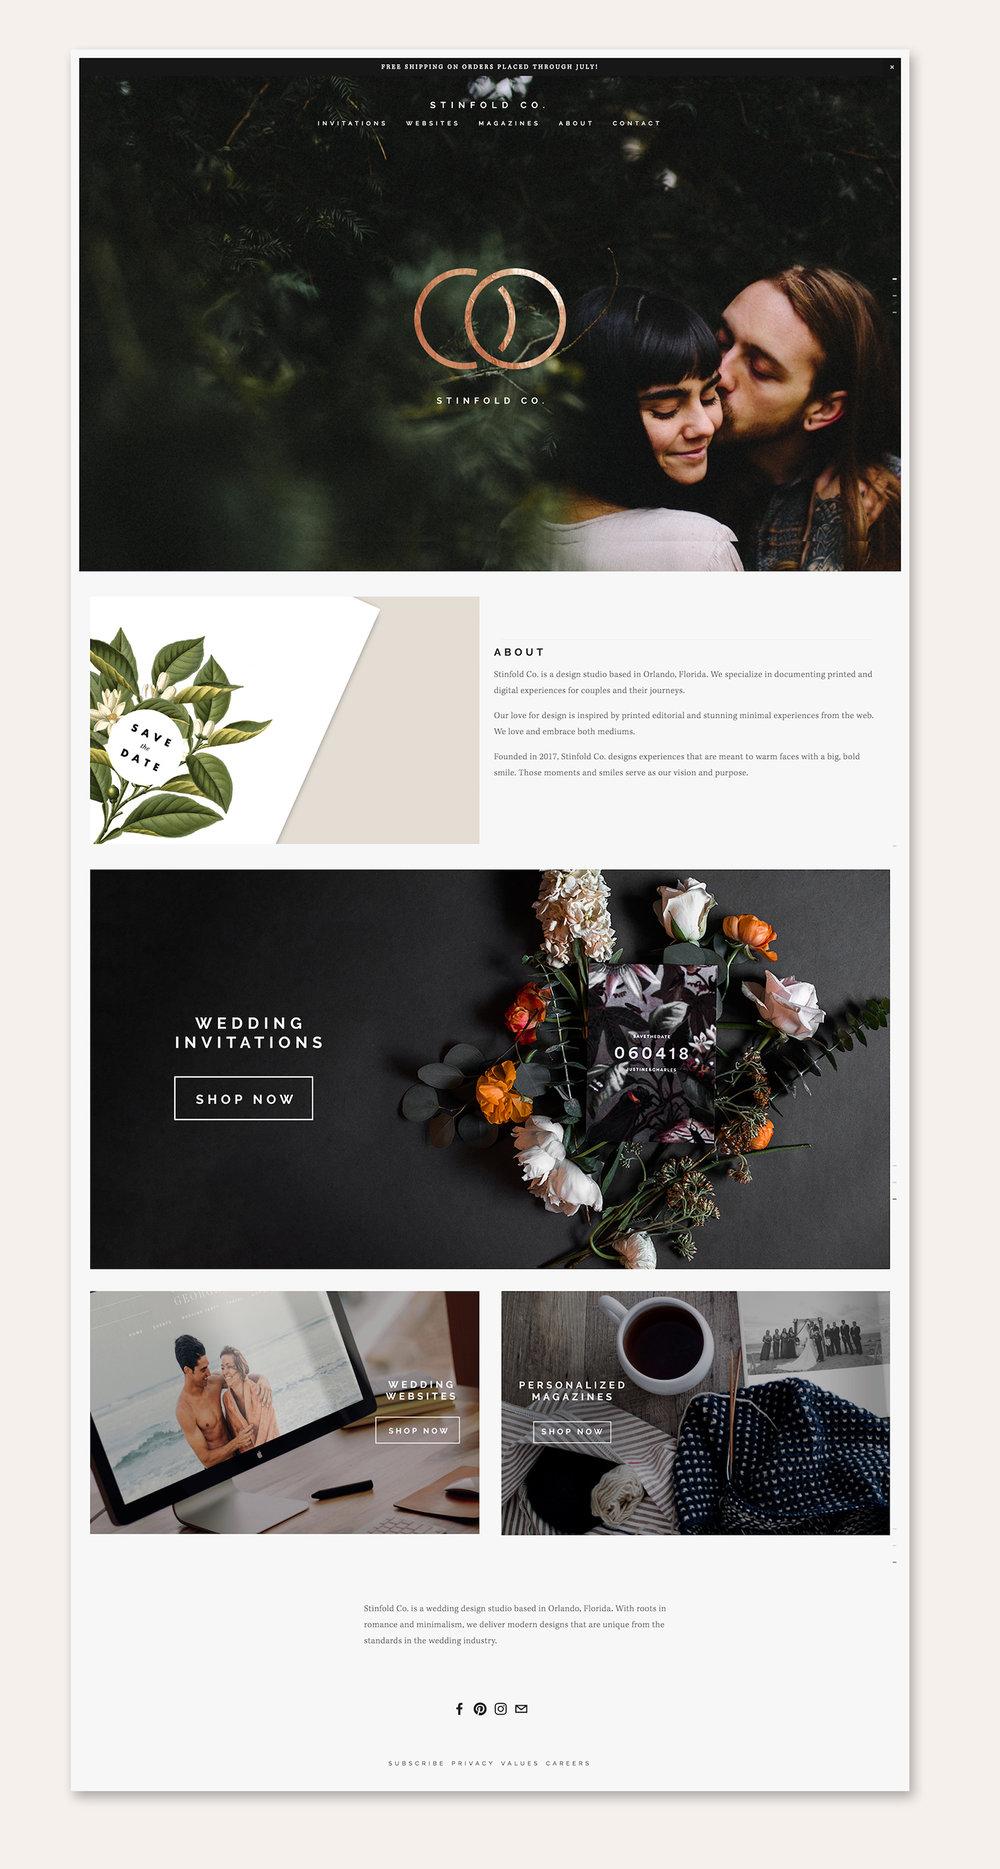 stinfold-website.jpg